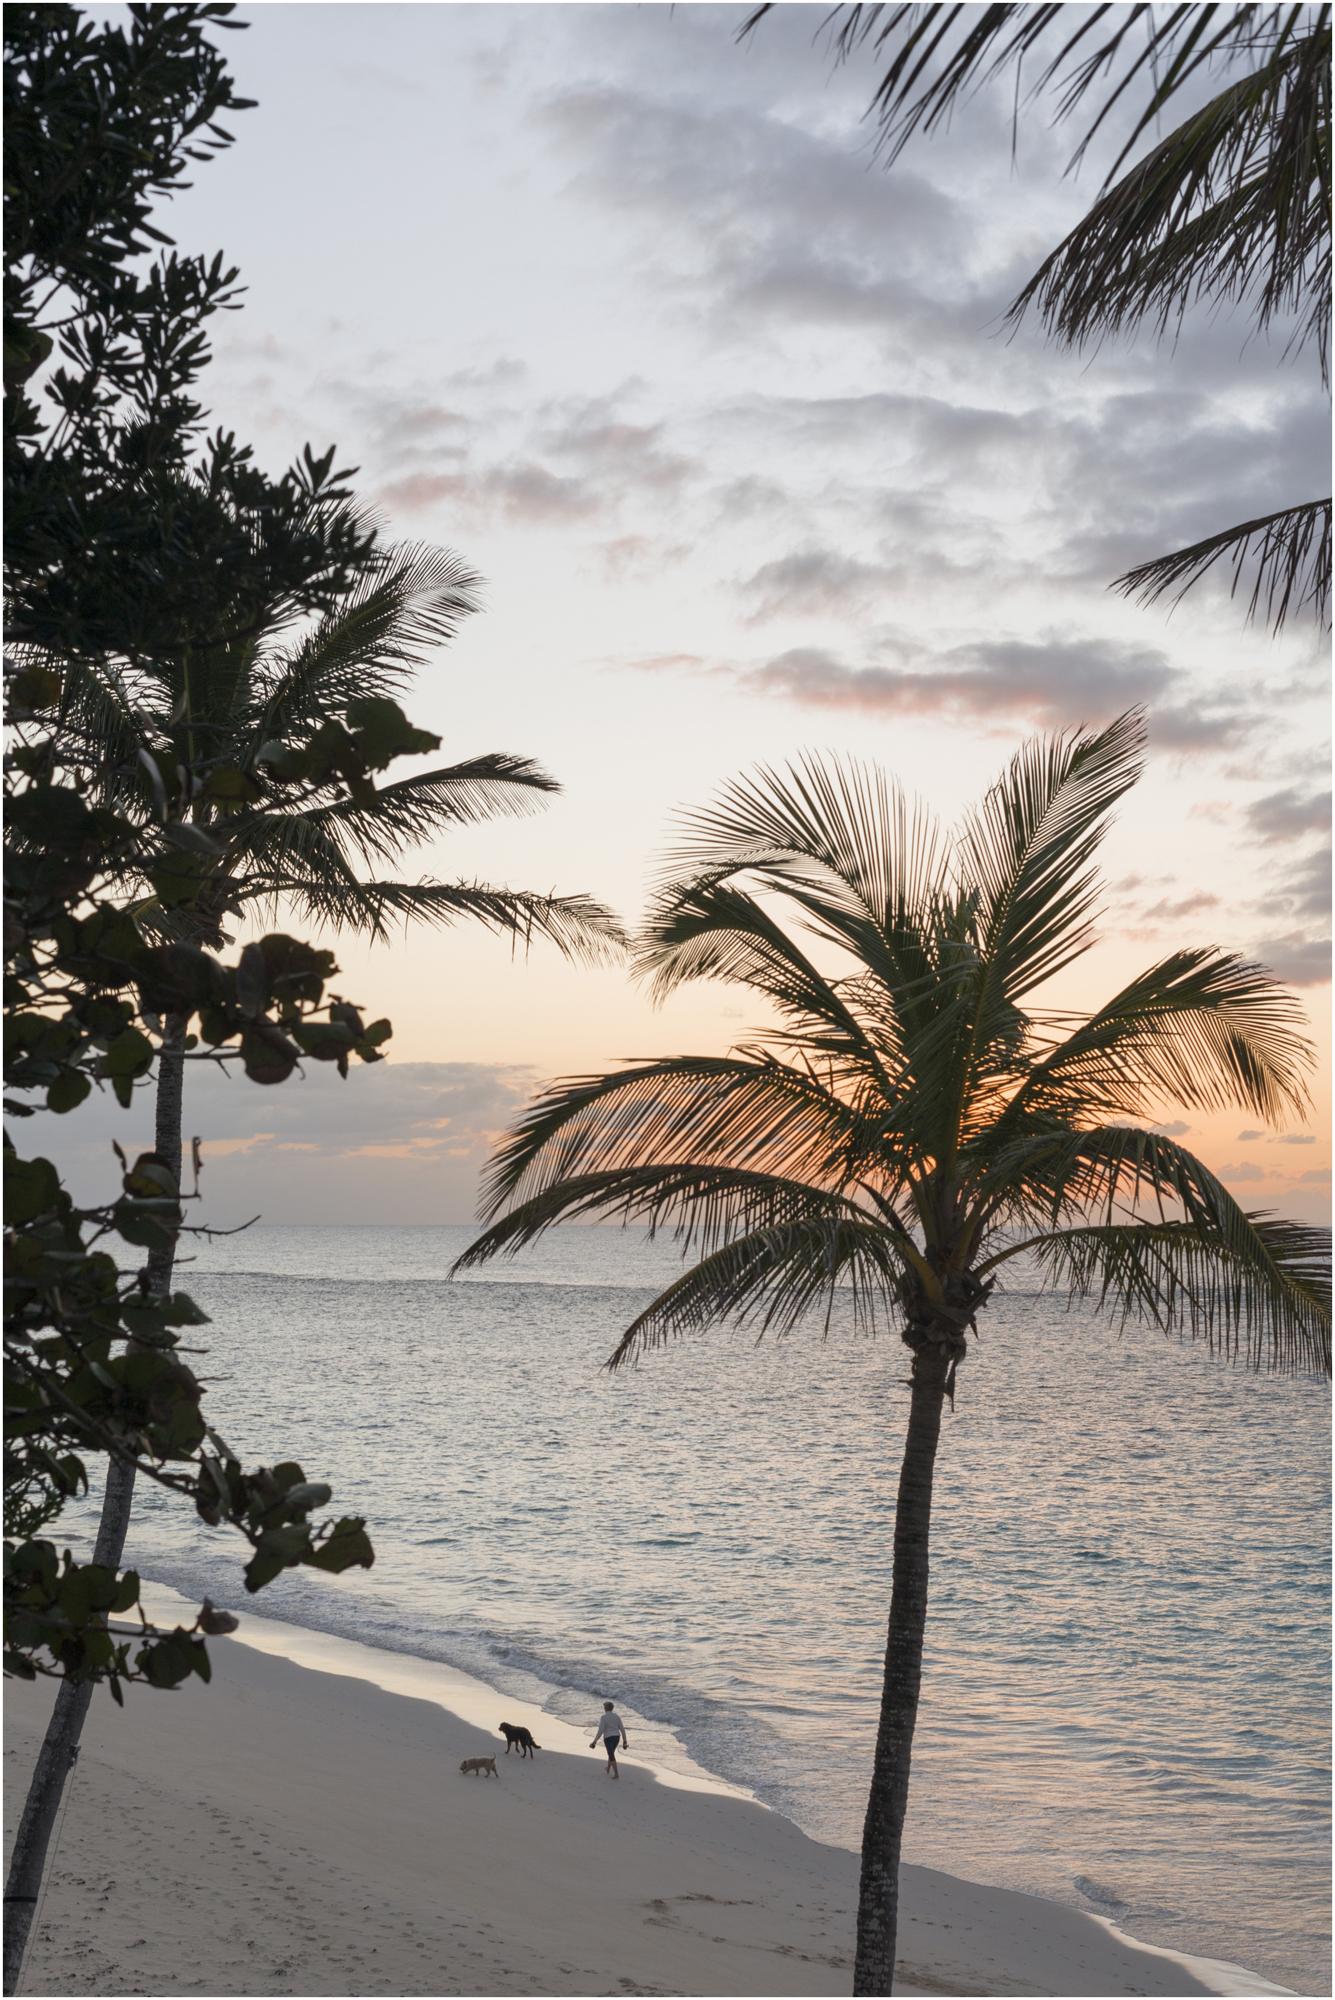 ©FianderFoto_Coral Beach_10.jpg